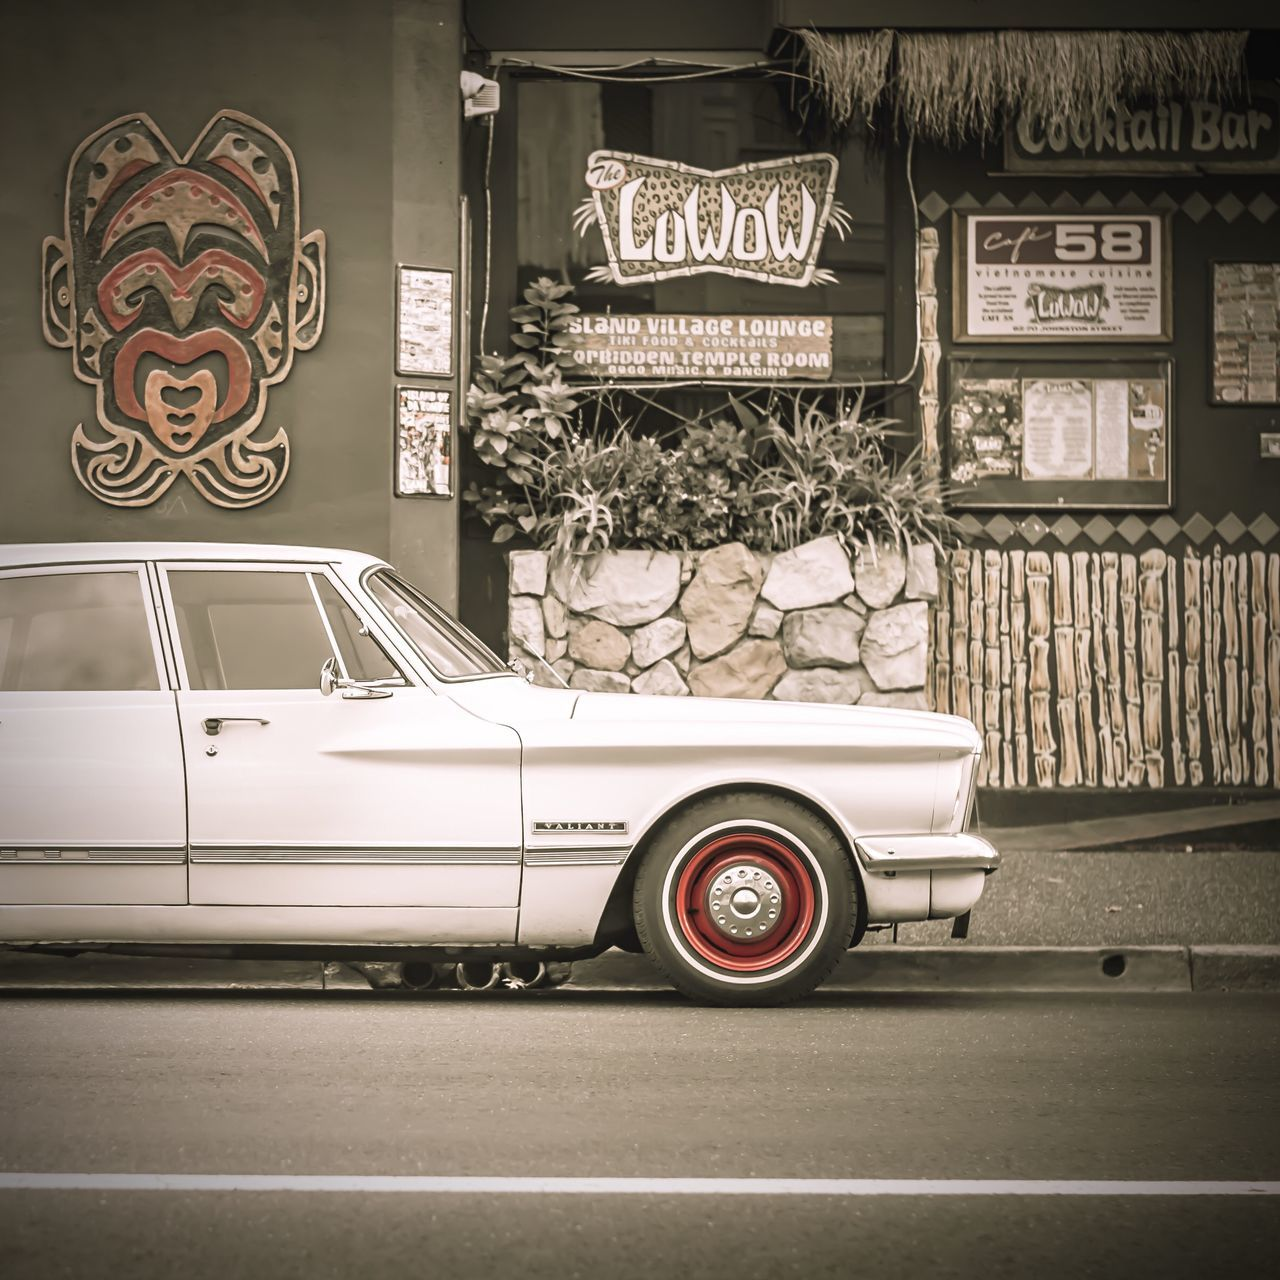 Super Retro Retro Car Vintage Melbourne Australia The Street Photographer - 2015 EyeEm Awards Mein Automoment